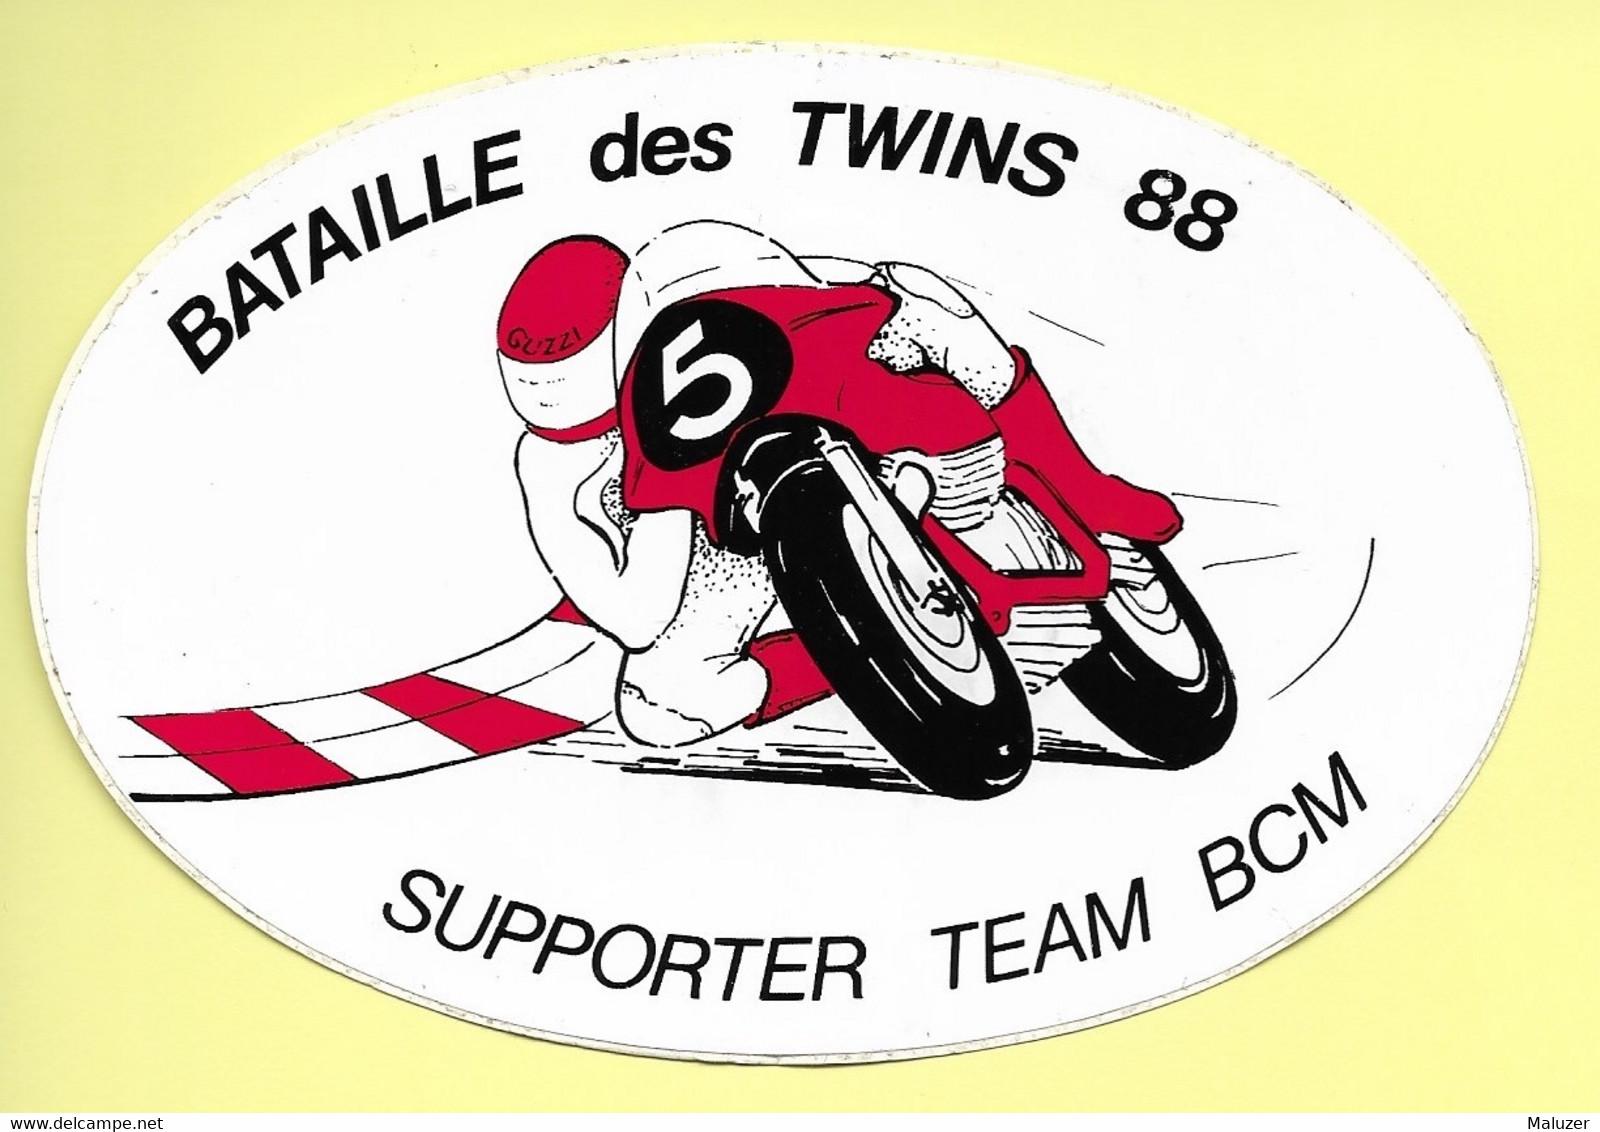 AUTOCOLLANT STICKER ADHÉSIF - BATAILLE DES TWINS 88 - SUPPORTER TEAM BCM - MOTO - MOTOS - SPORT - Stickers